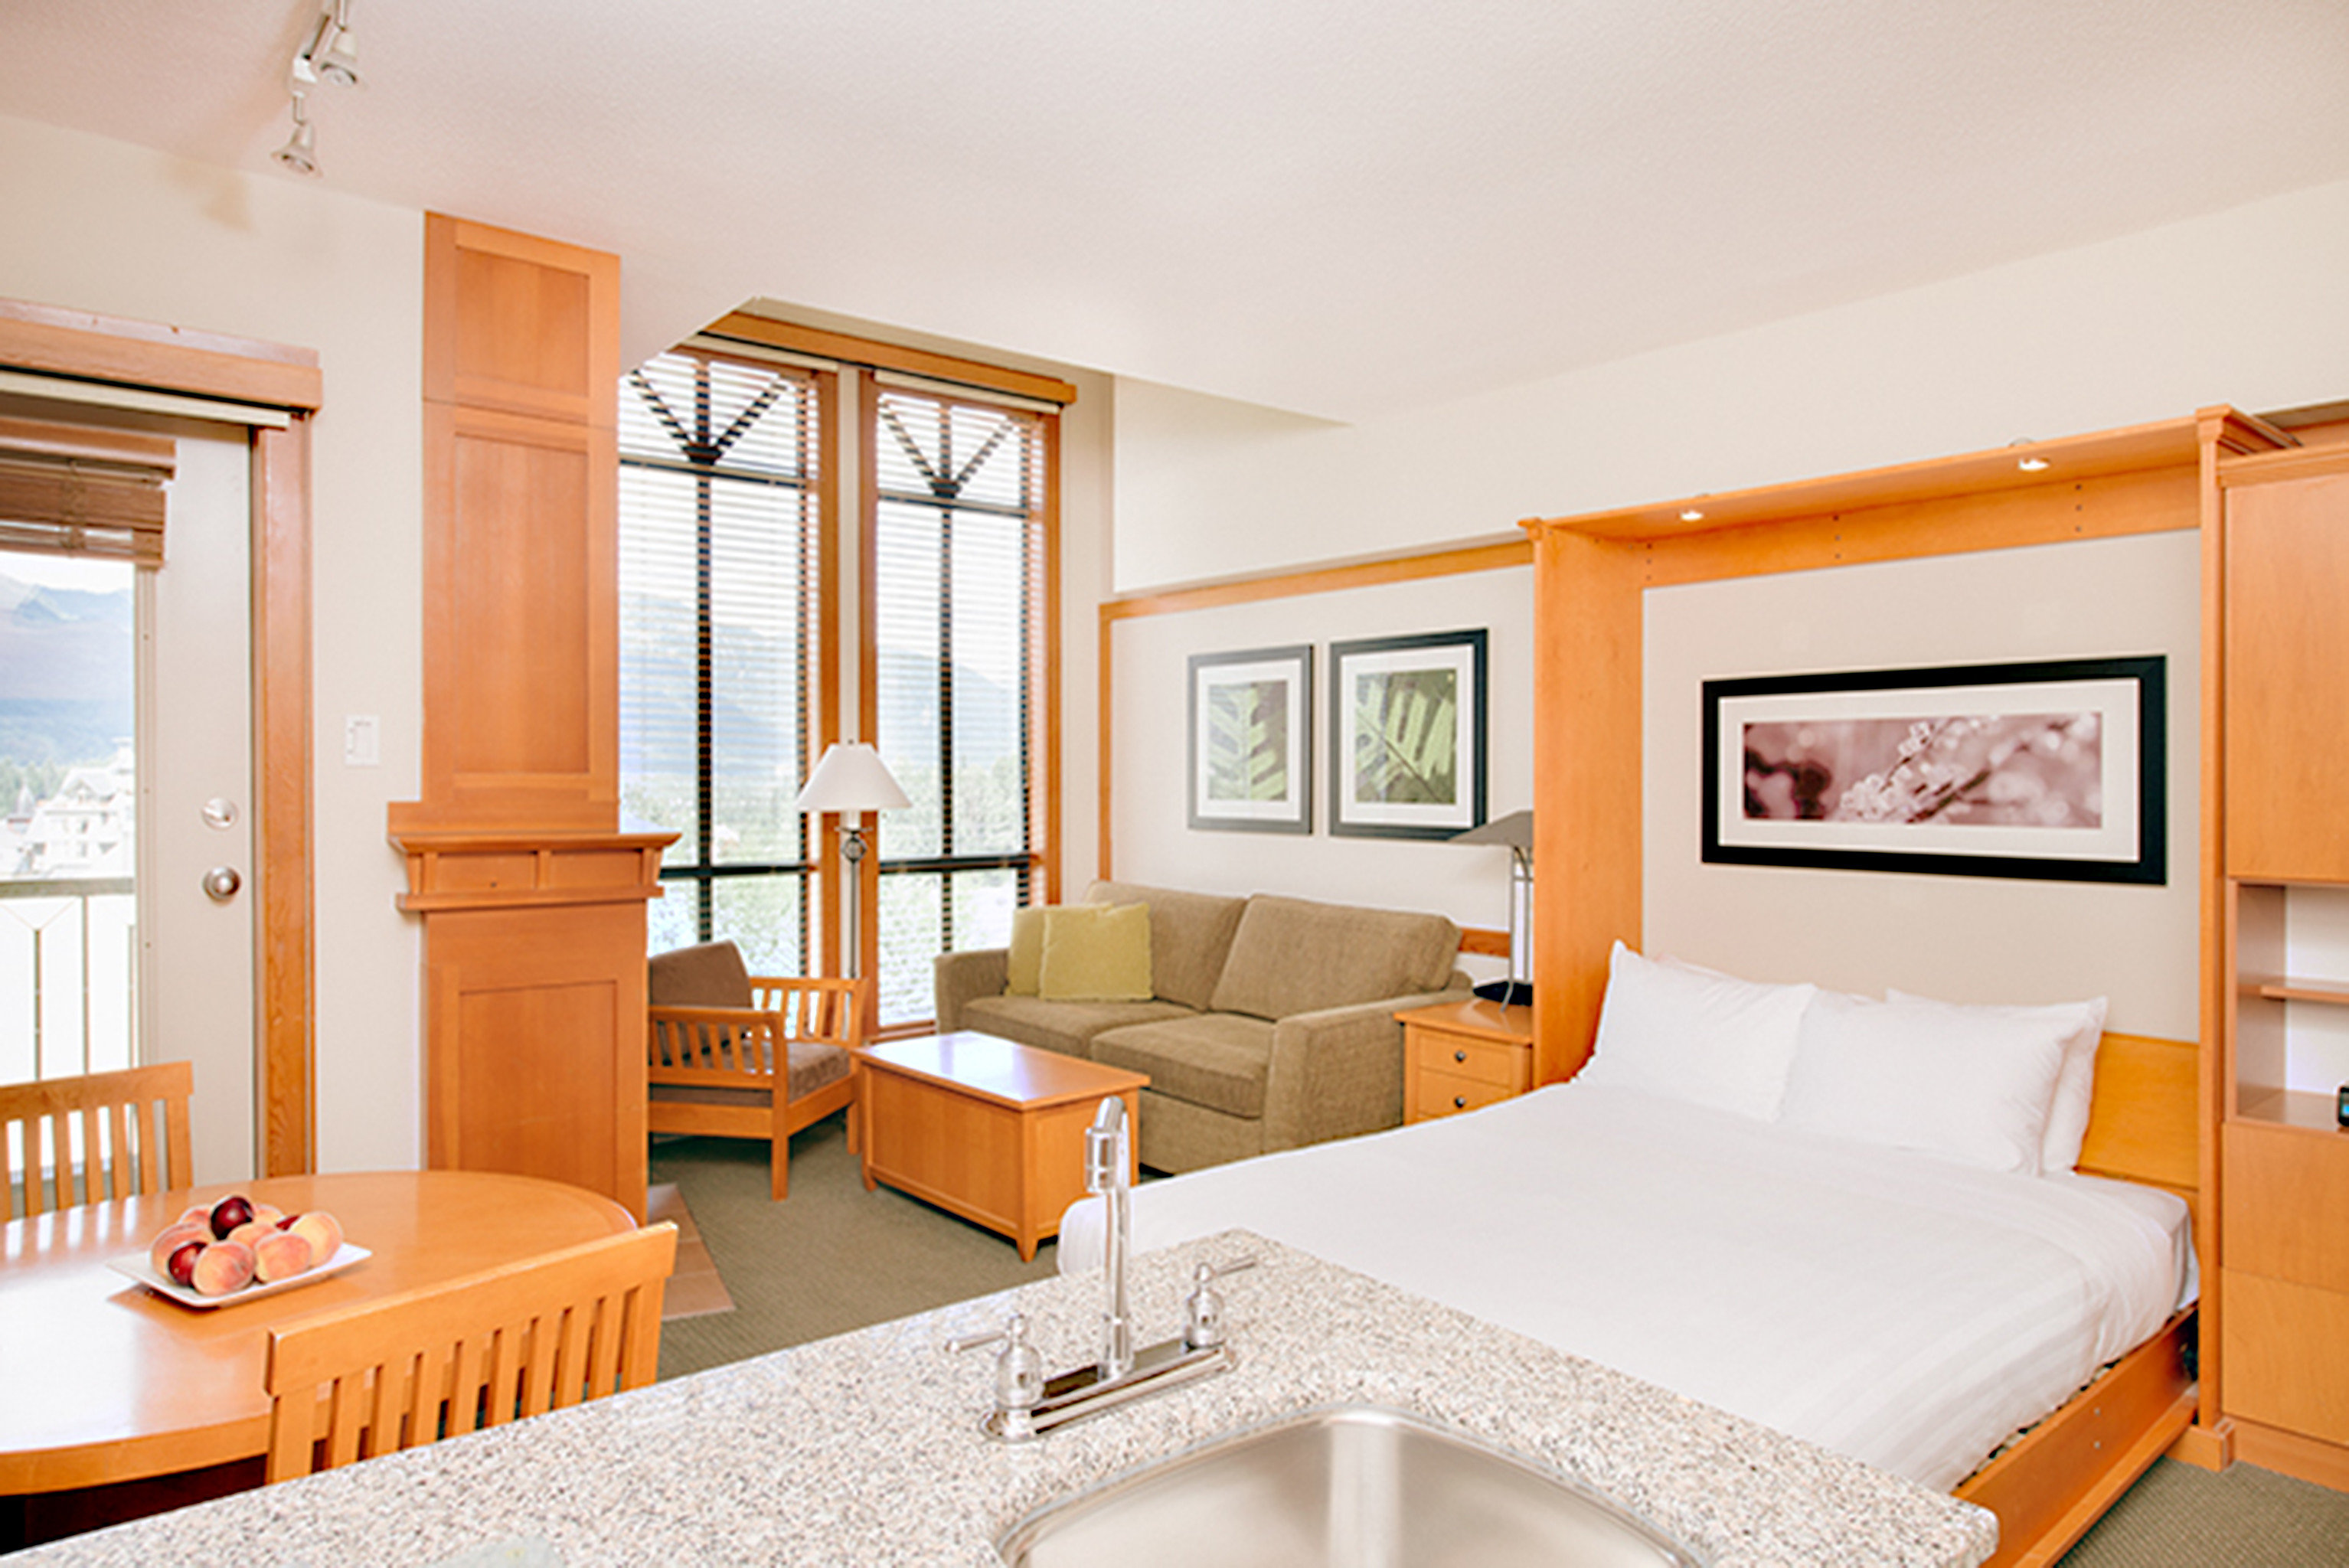 Bedroom Hip Kitchen Scenic views Suite property cottage condominium living room home Villa